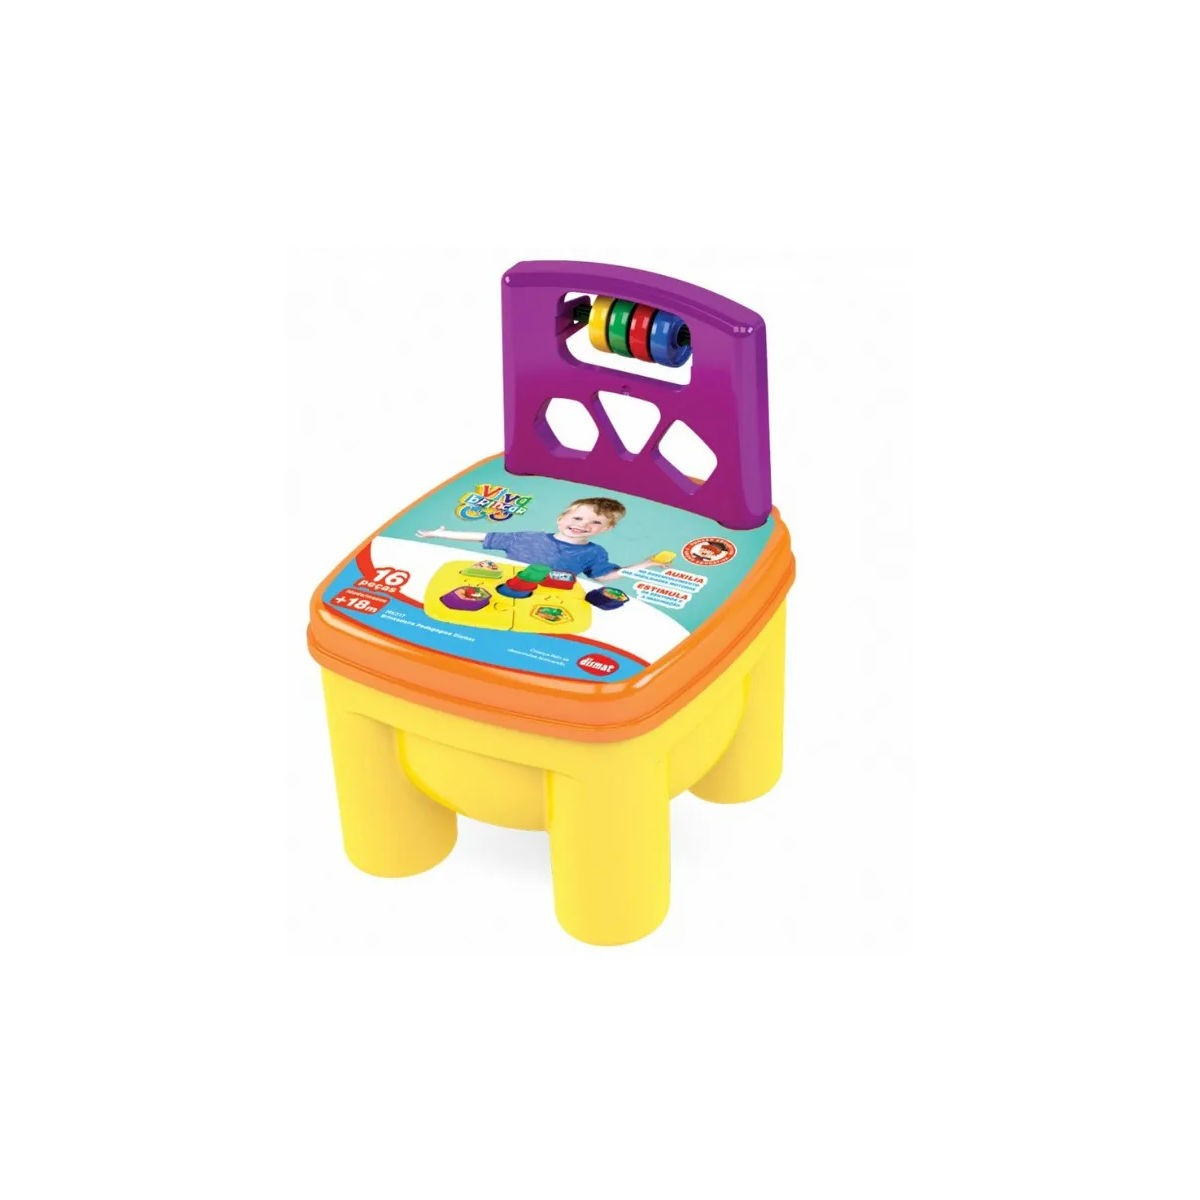 Cadeira Educativa Infantil Brinkadeira Pedagógica MK217